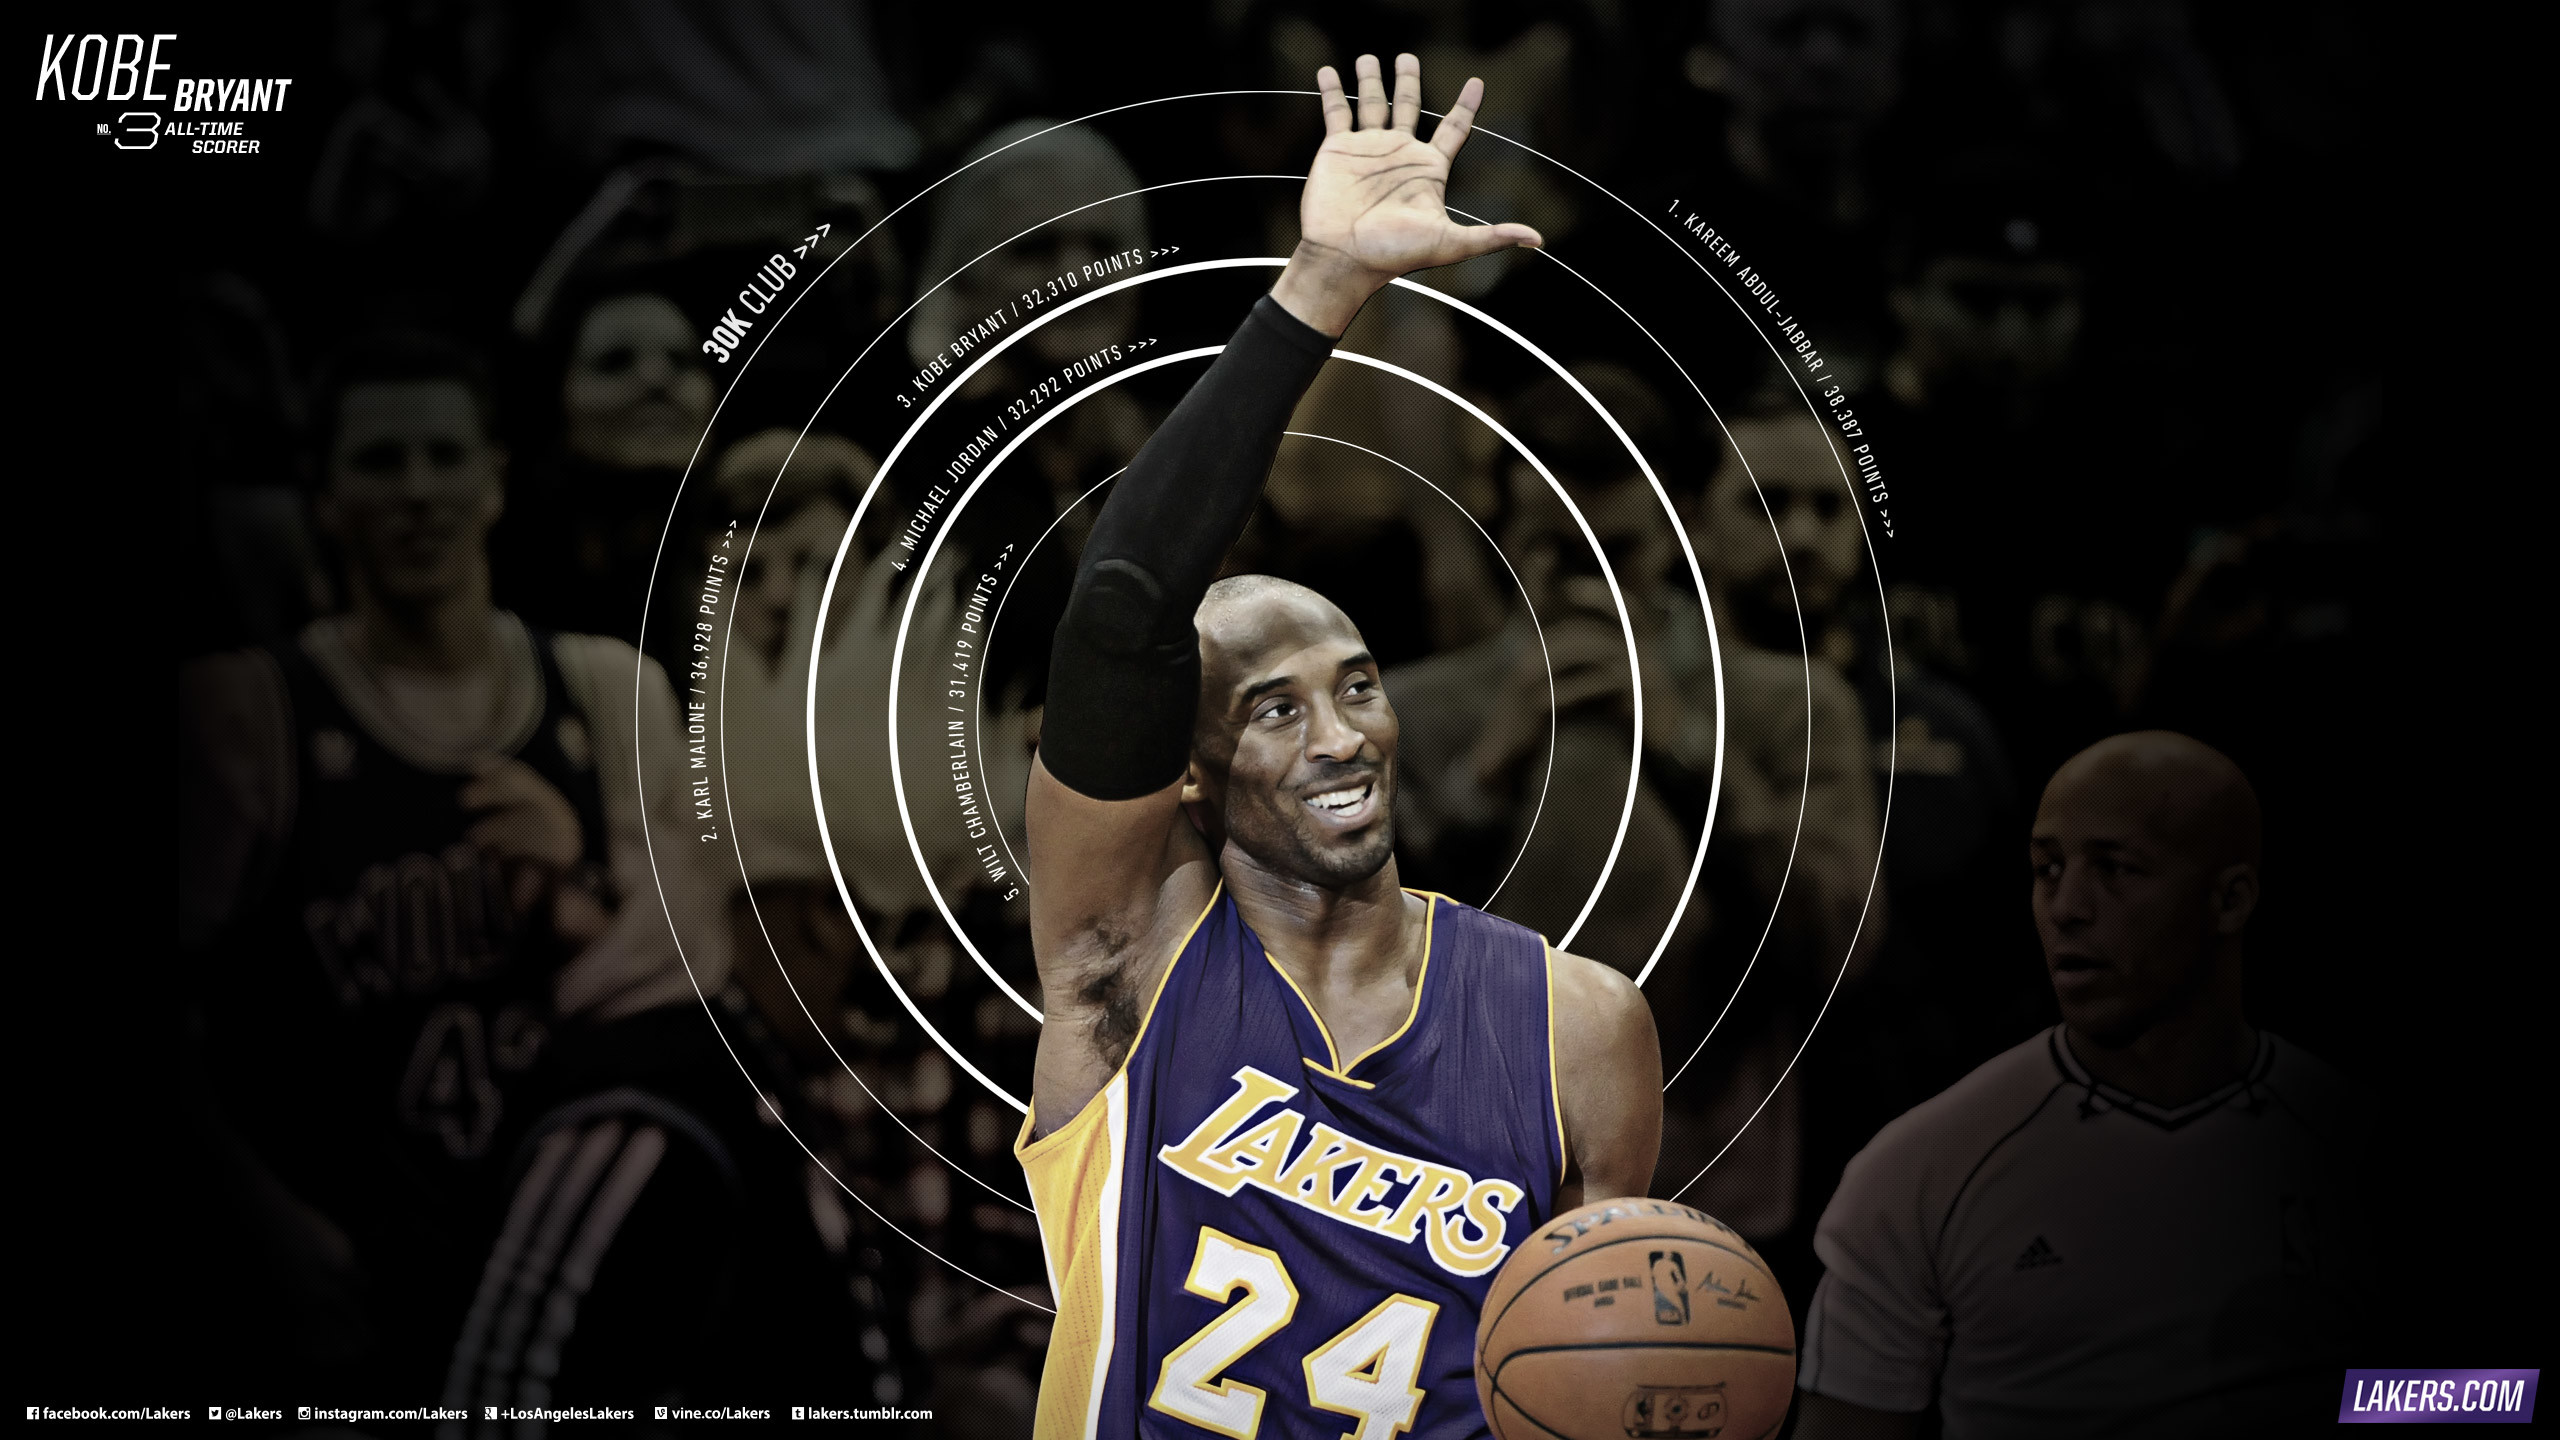 Kobe Bryant Passes Michael Jordan   Data-src - Kobe Bryant Wallpaper Hd - HD Wallpaper